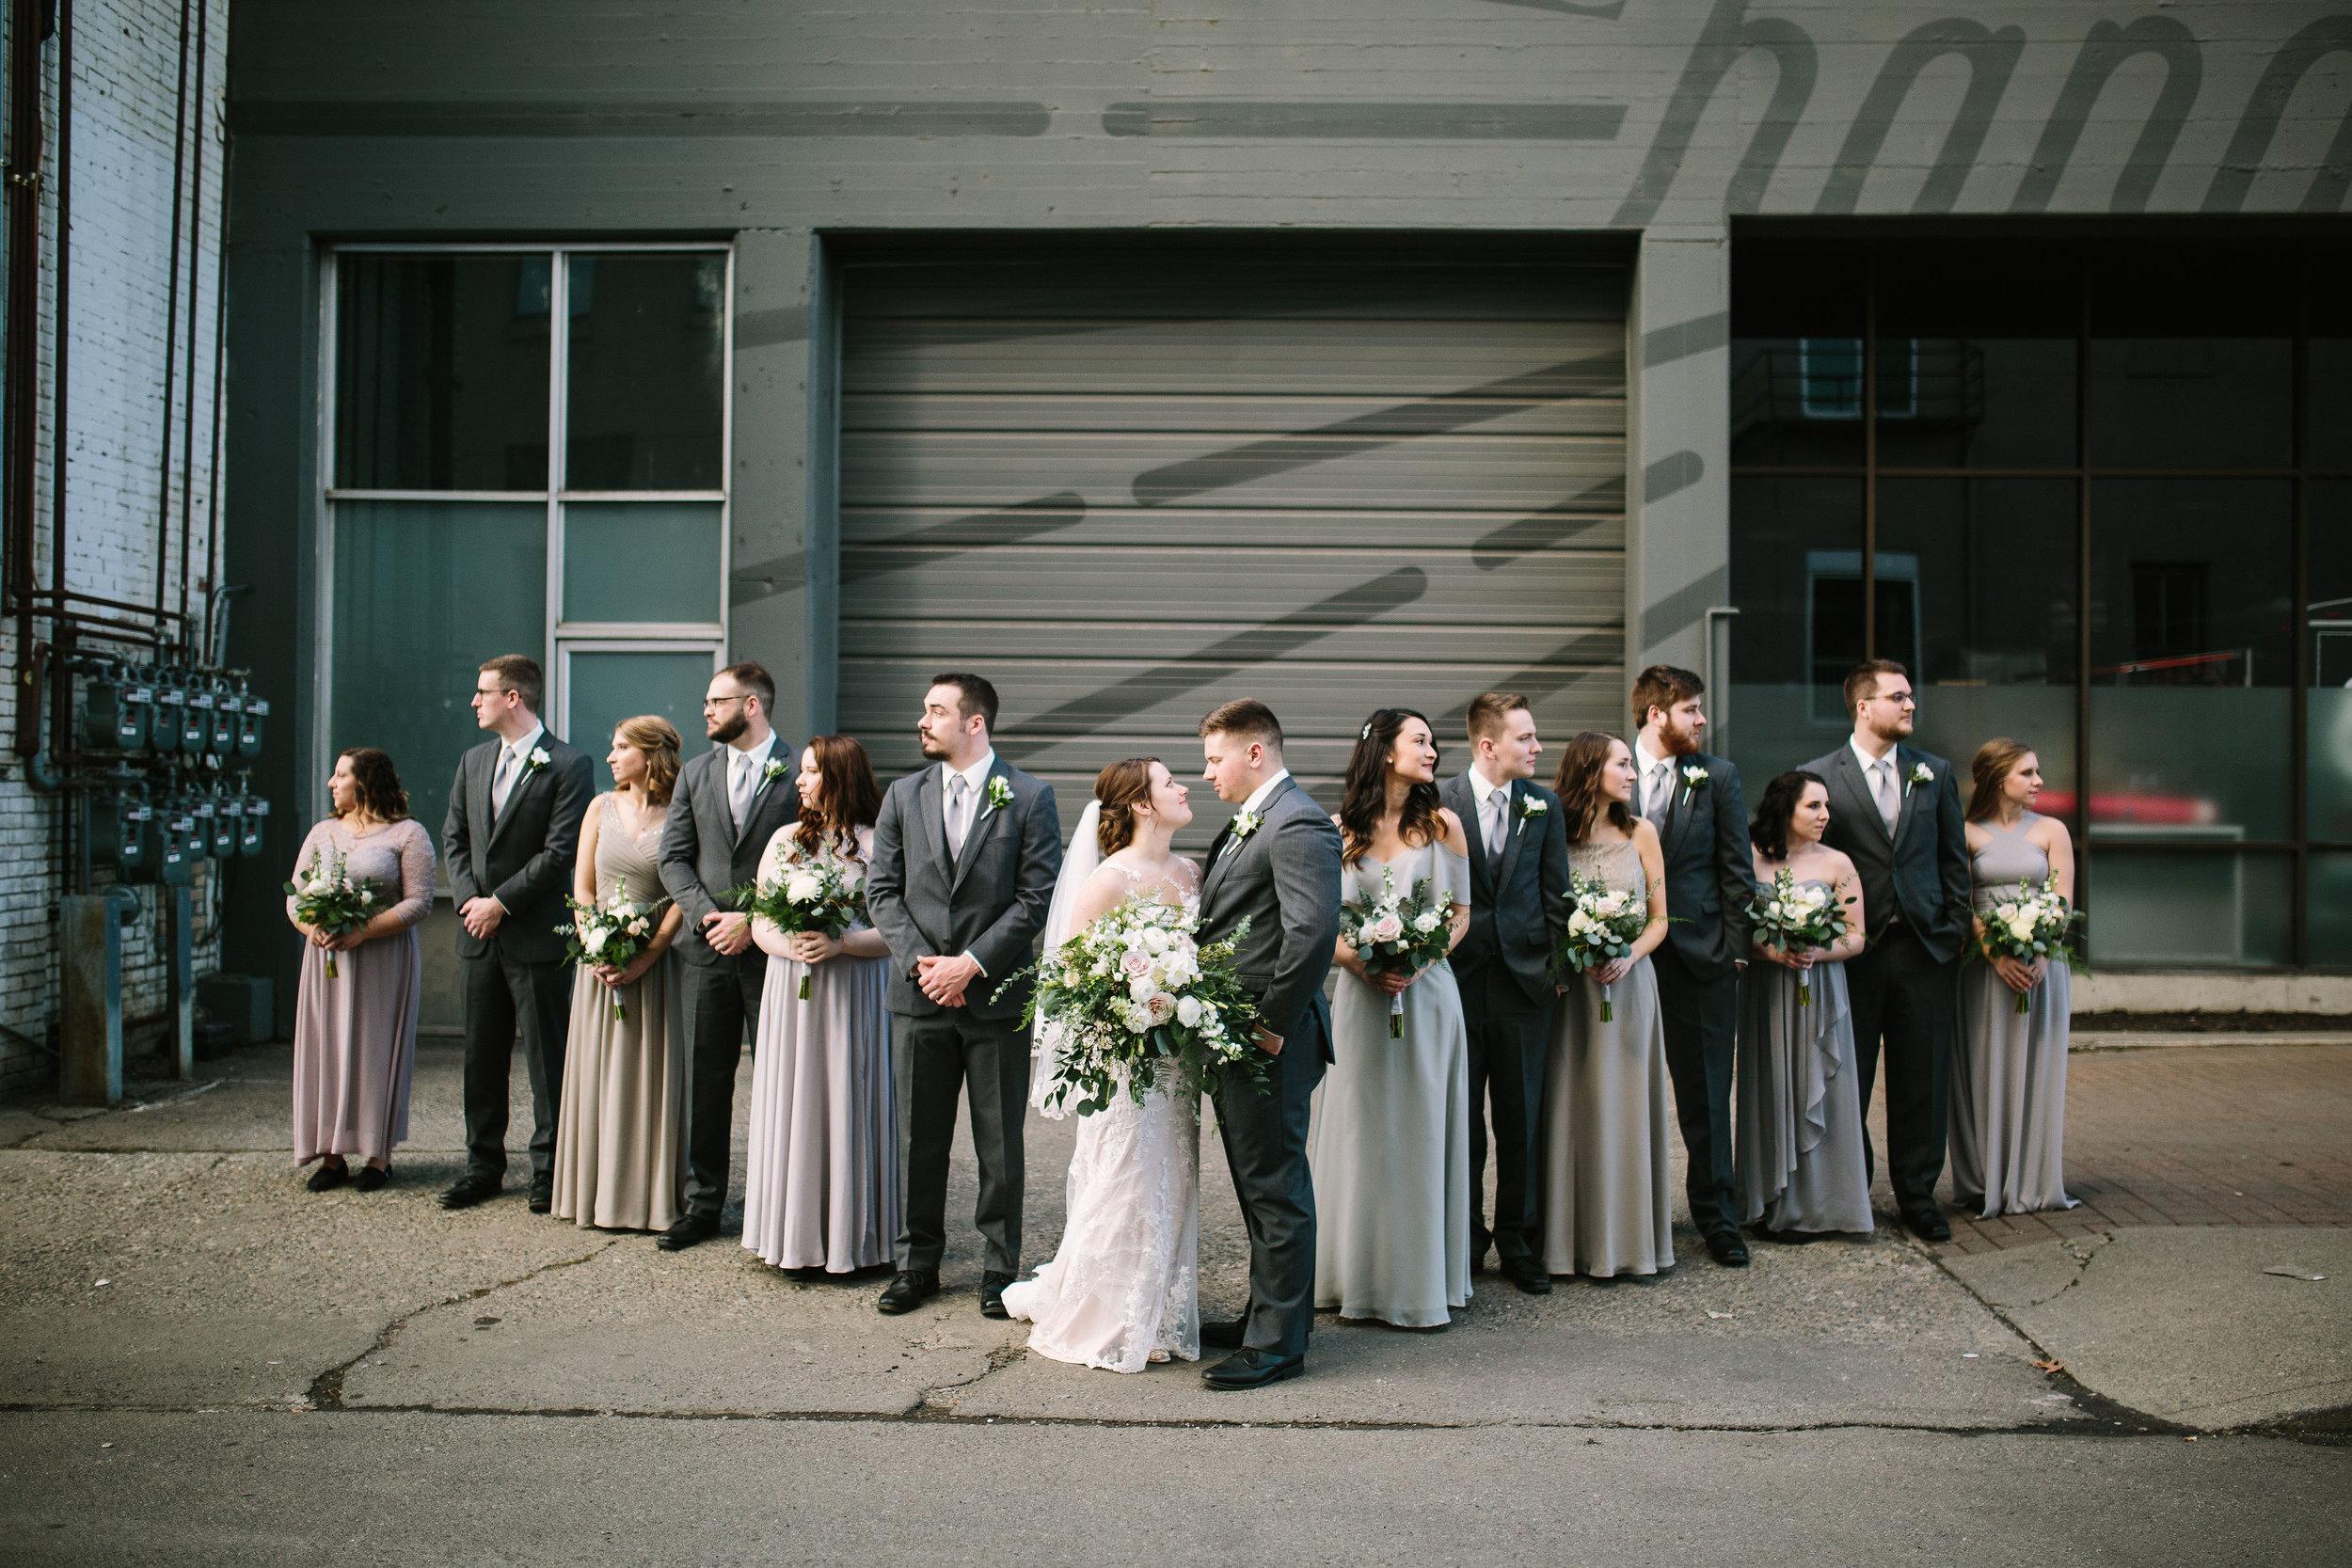 Fun Rustic spokane wedding pictures couple looking bridesmaids groomsmen look away